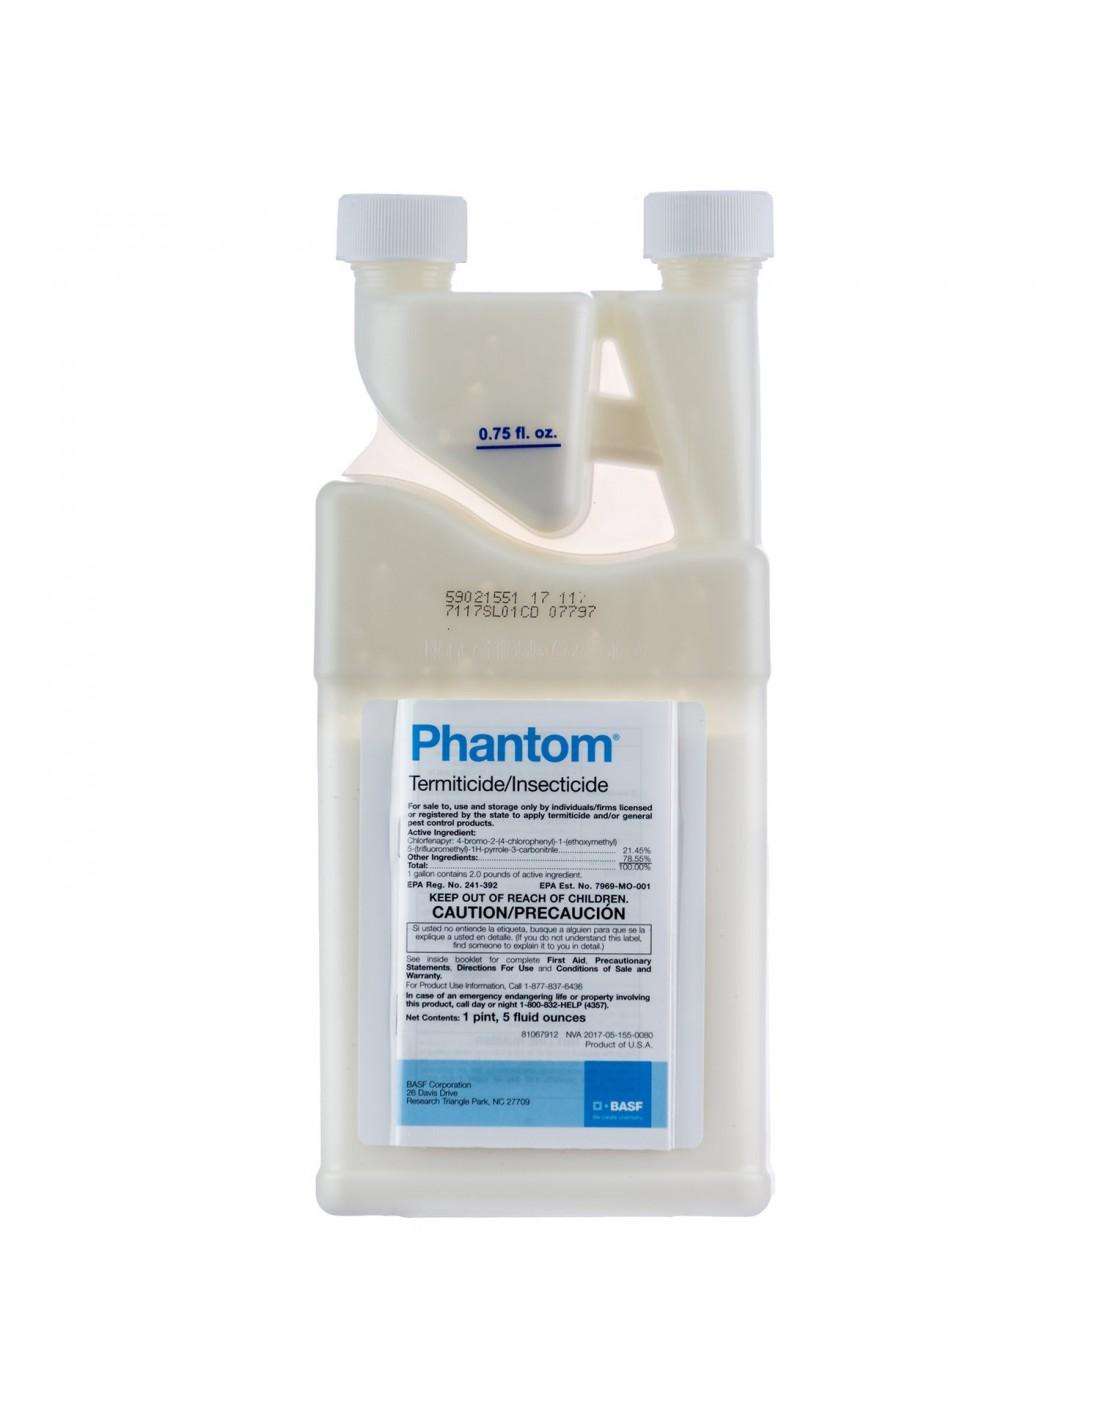 Phantom Termiticide Insecticide